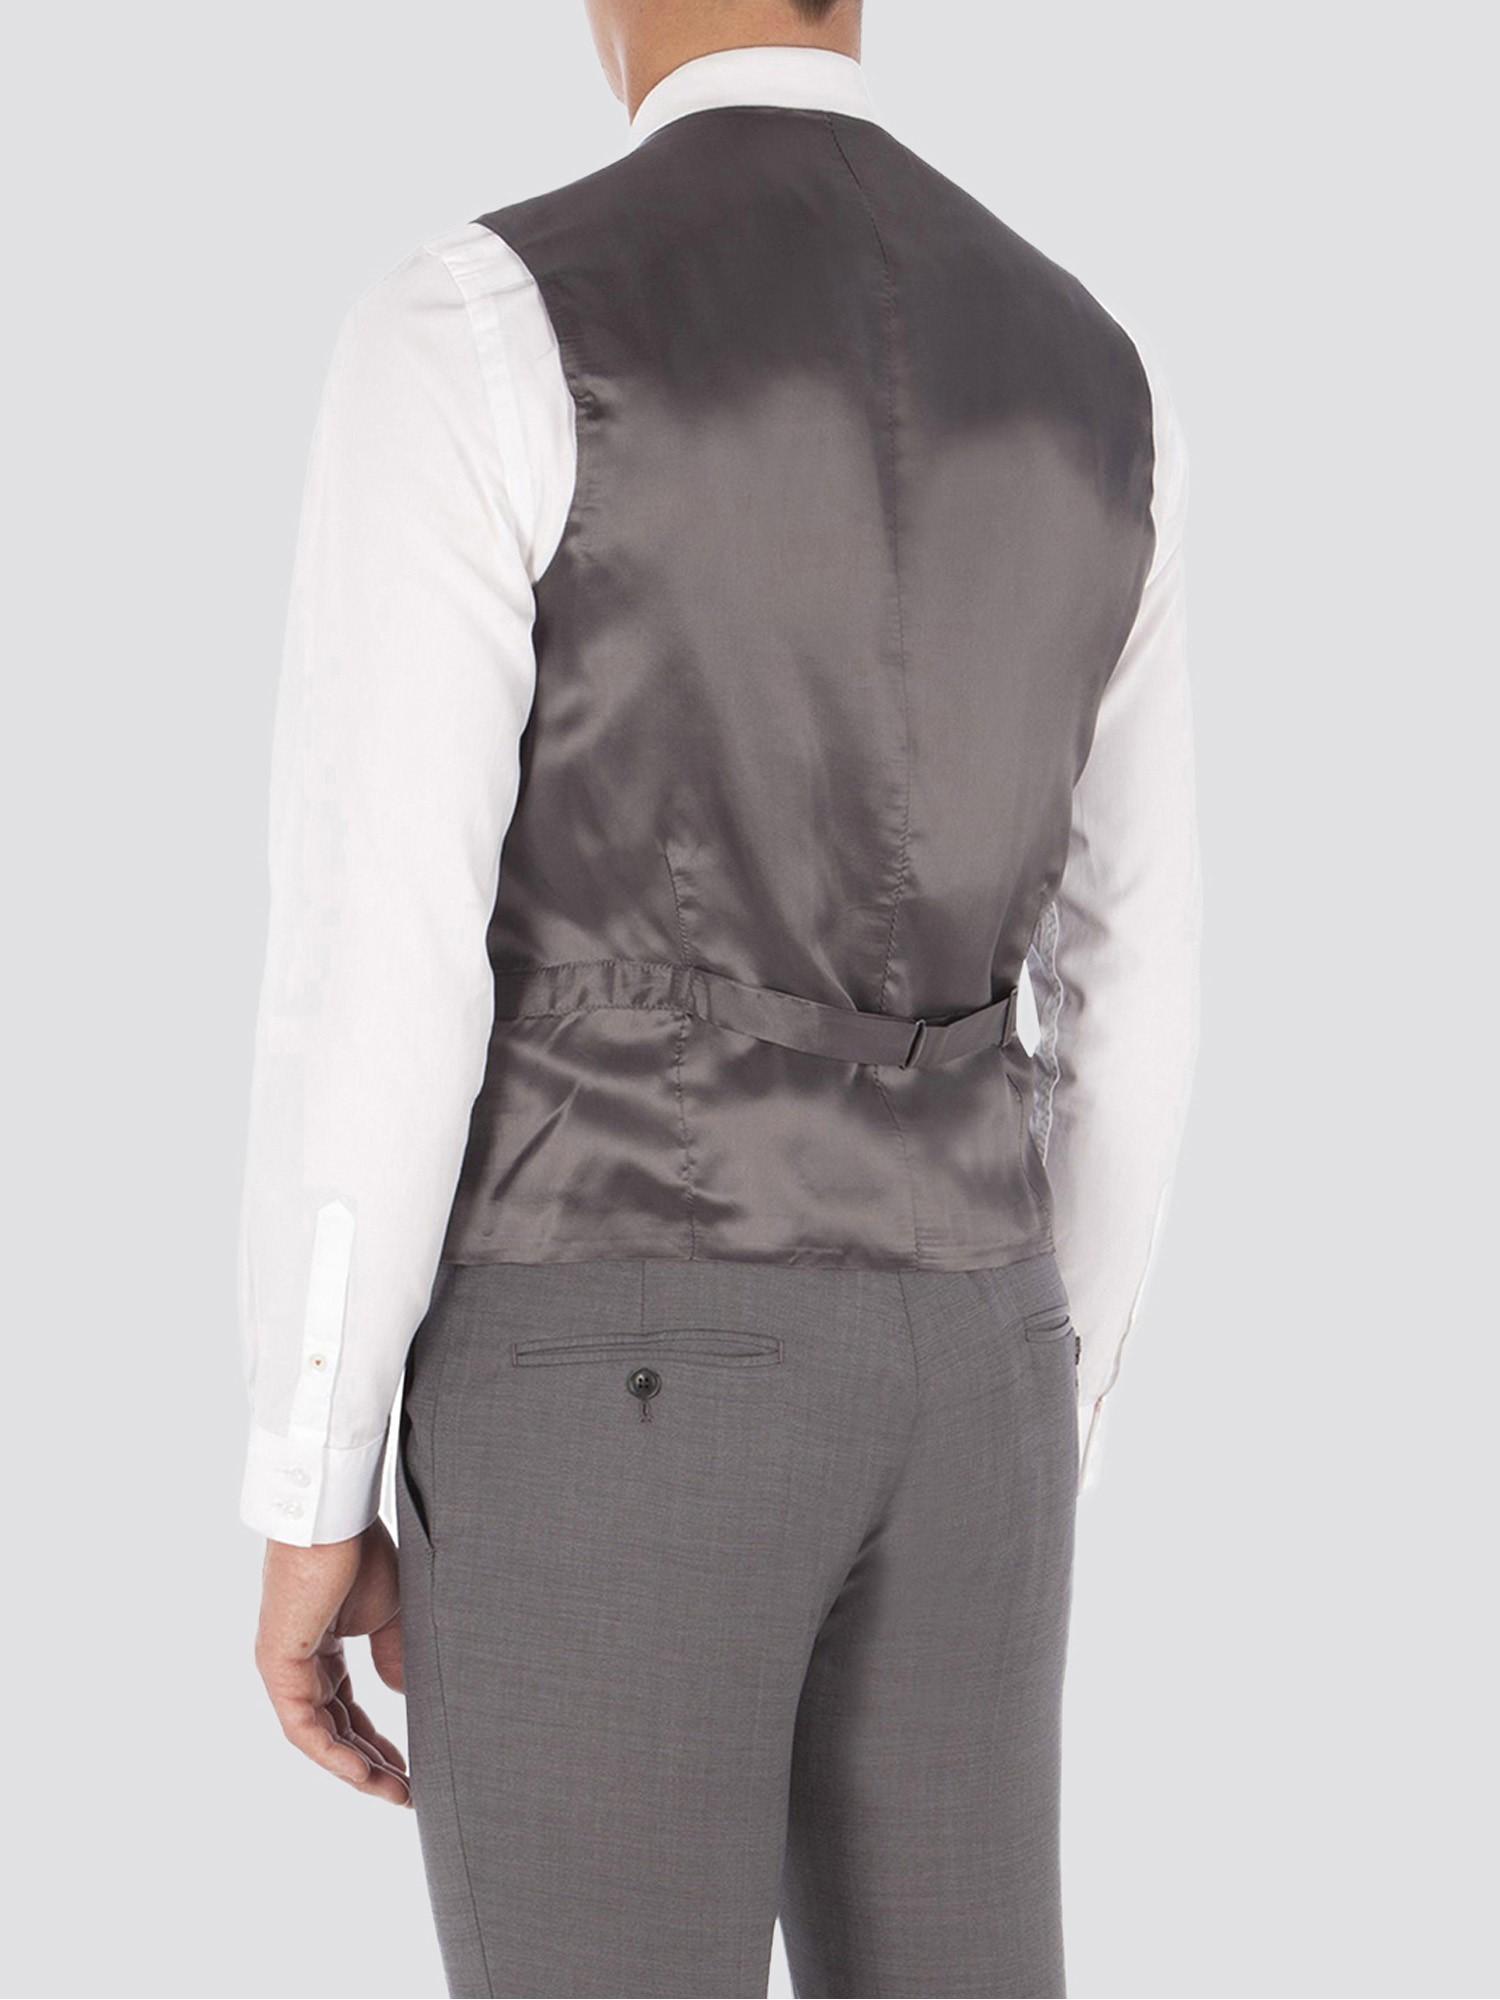 Smoked Pearl Tonic Waistcoat